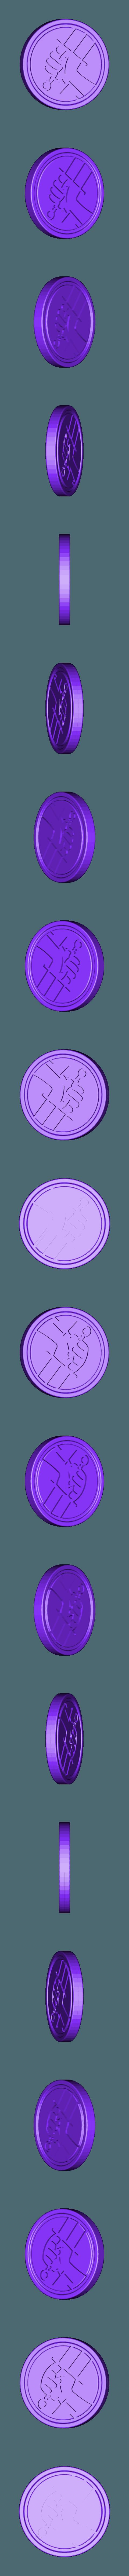 hellboy_coin.stl Download free STL file hellboy coin • 3D printable design, A_SKEWED_VIEW_3D